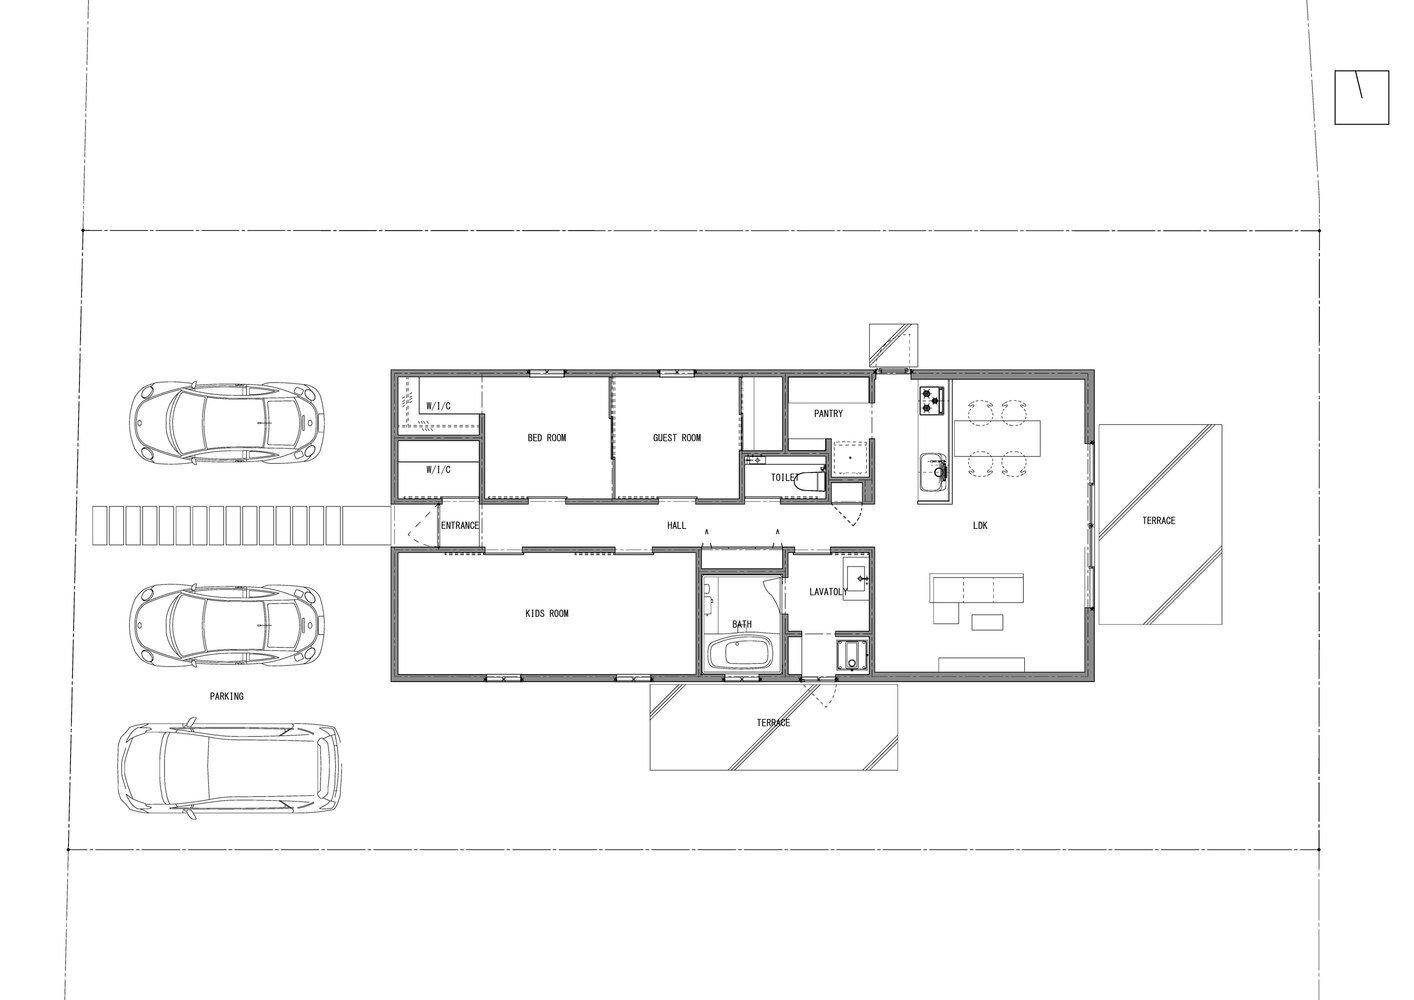 loft-house-capd-japan-floor-plan-humble-homes